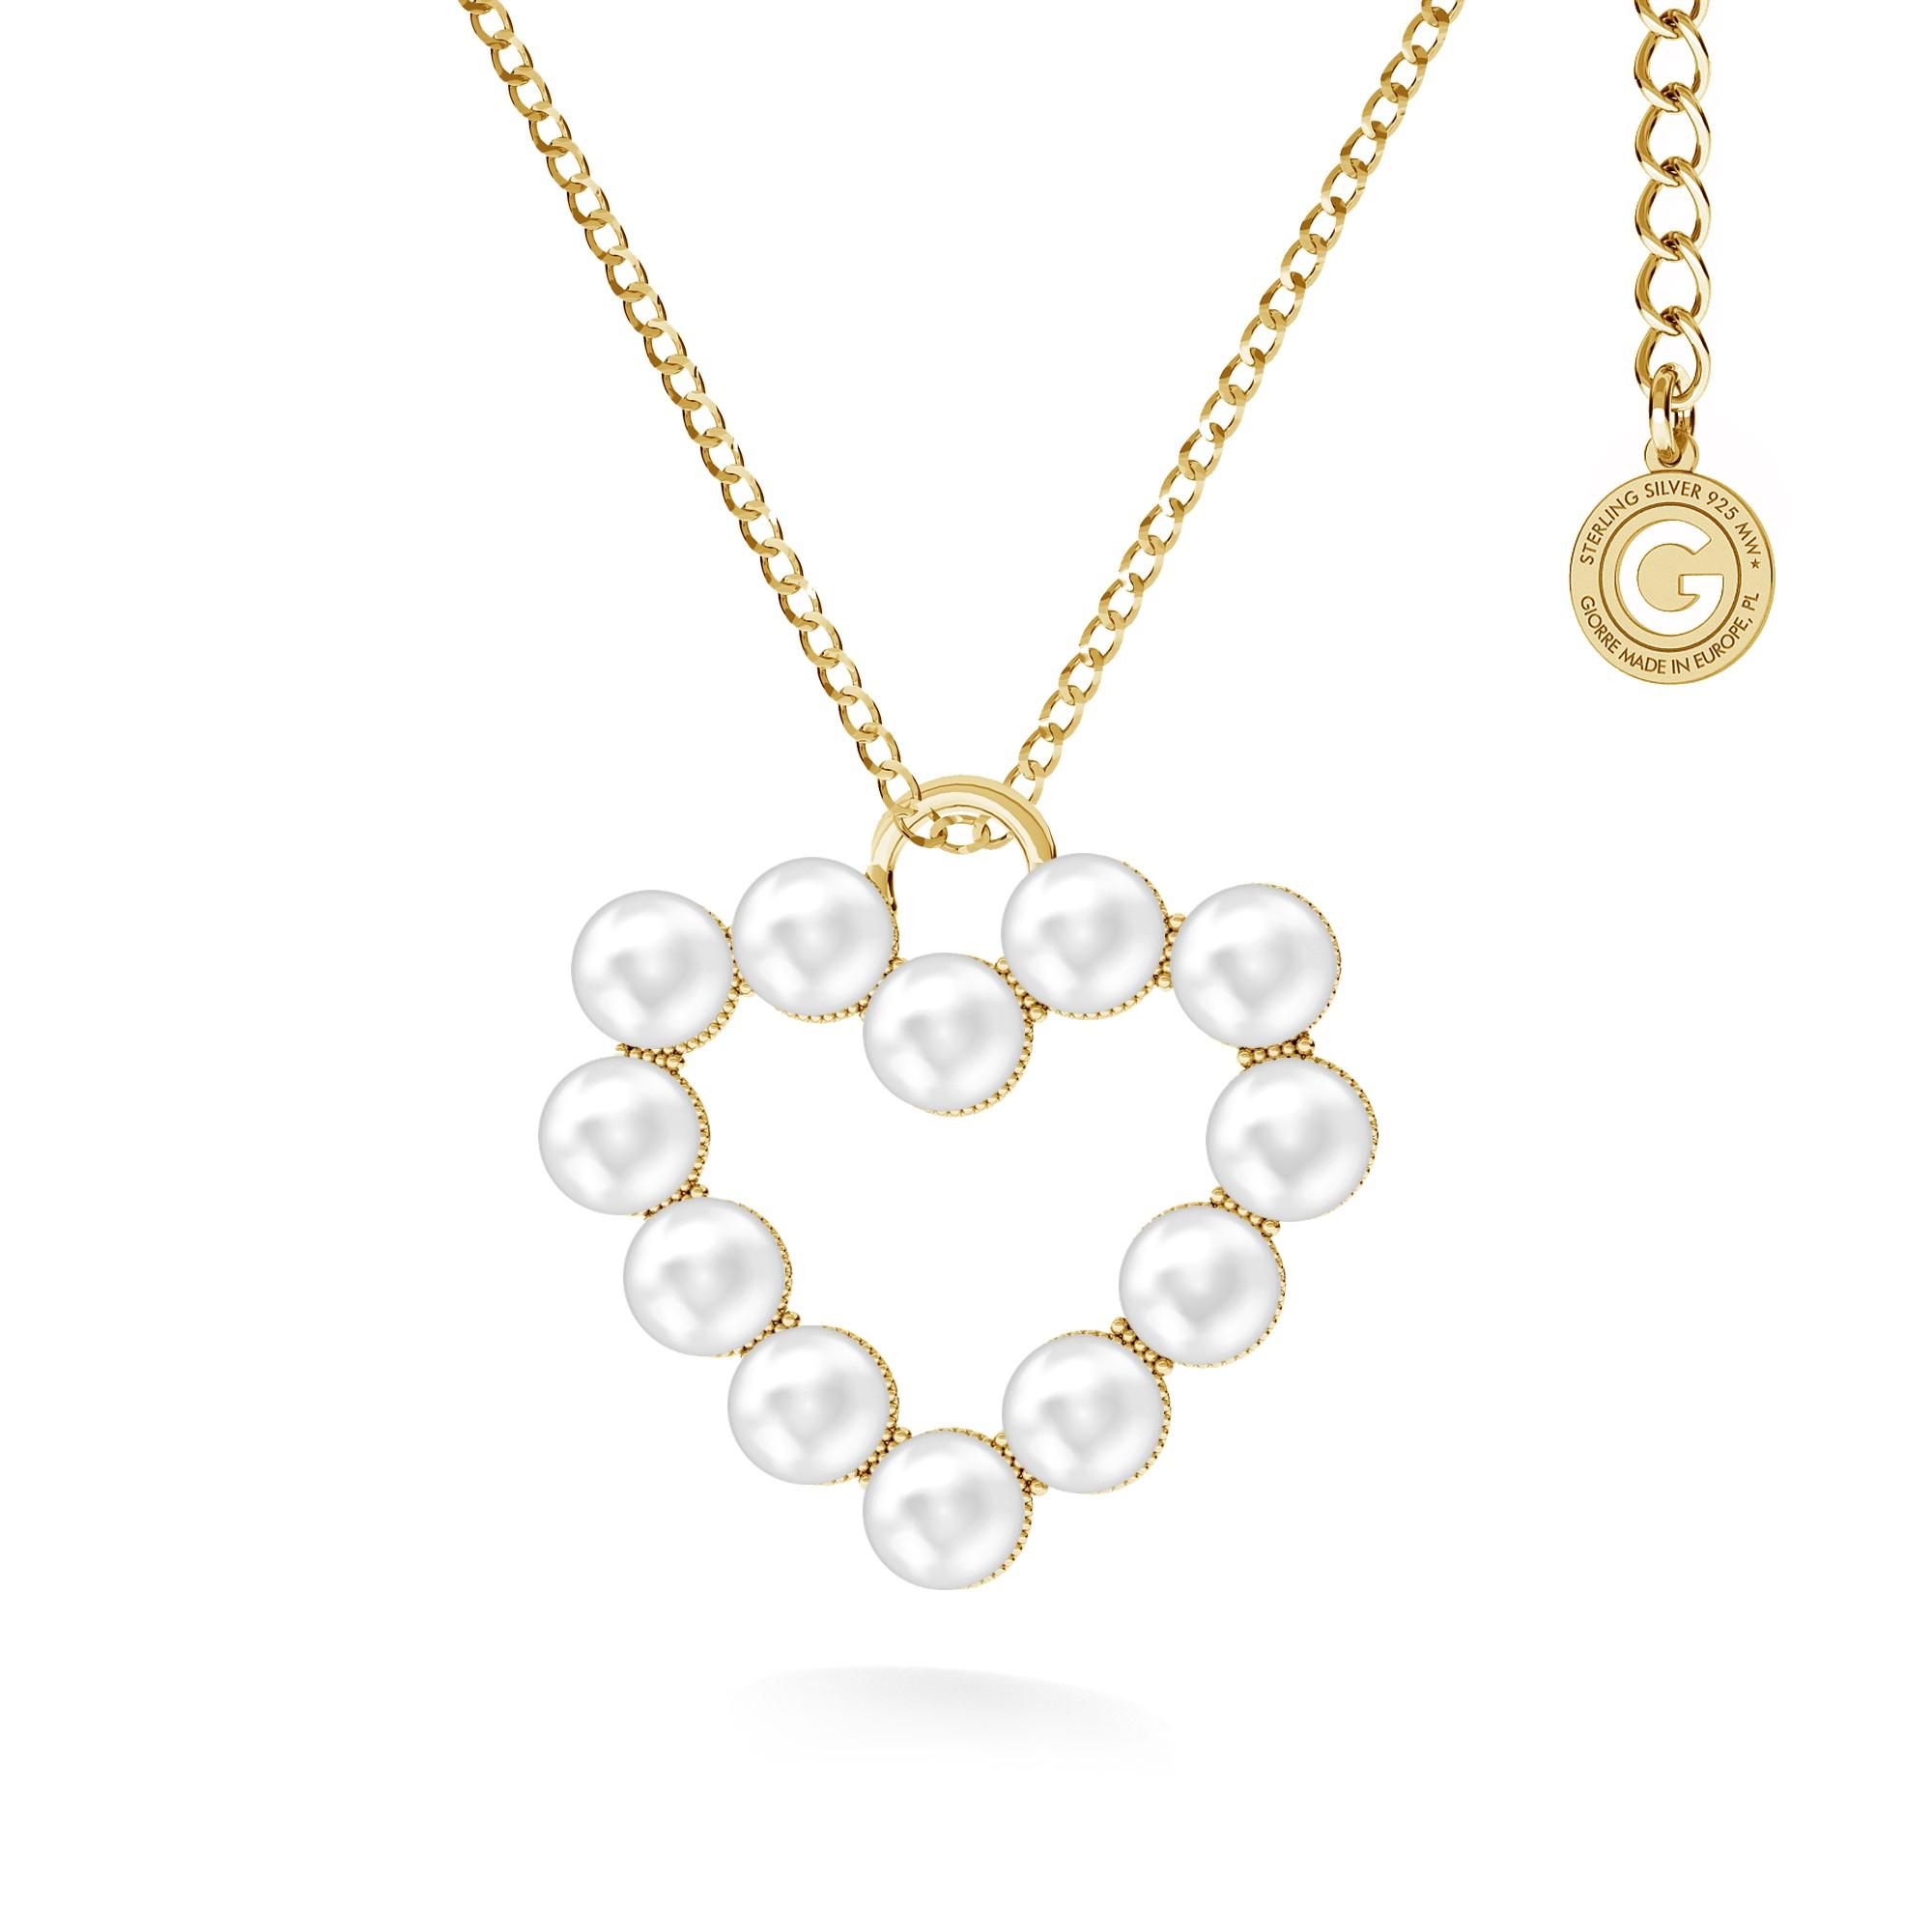 Cross necklace with swarovski pearls, silver 925 & swarovski